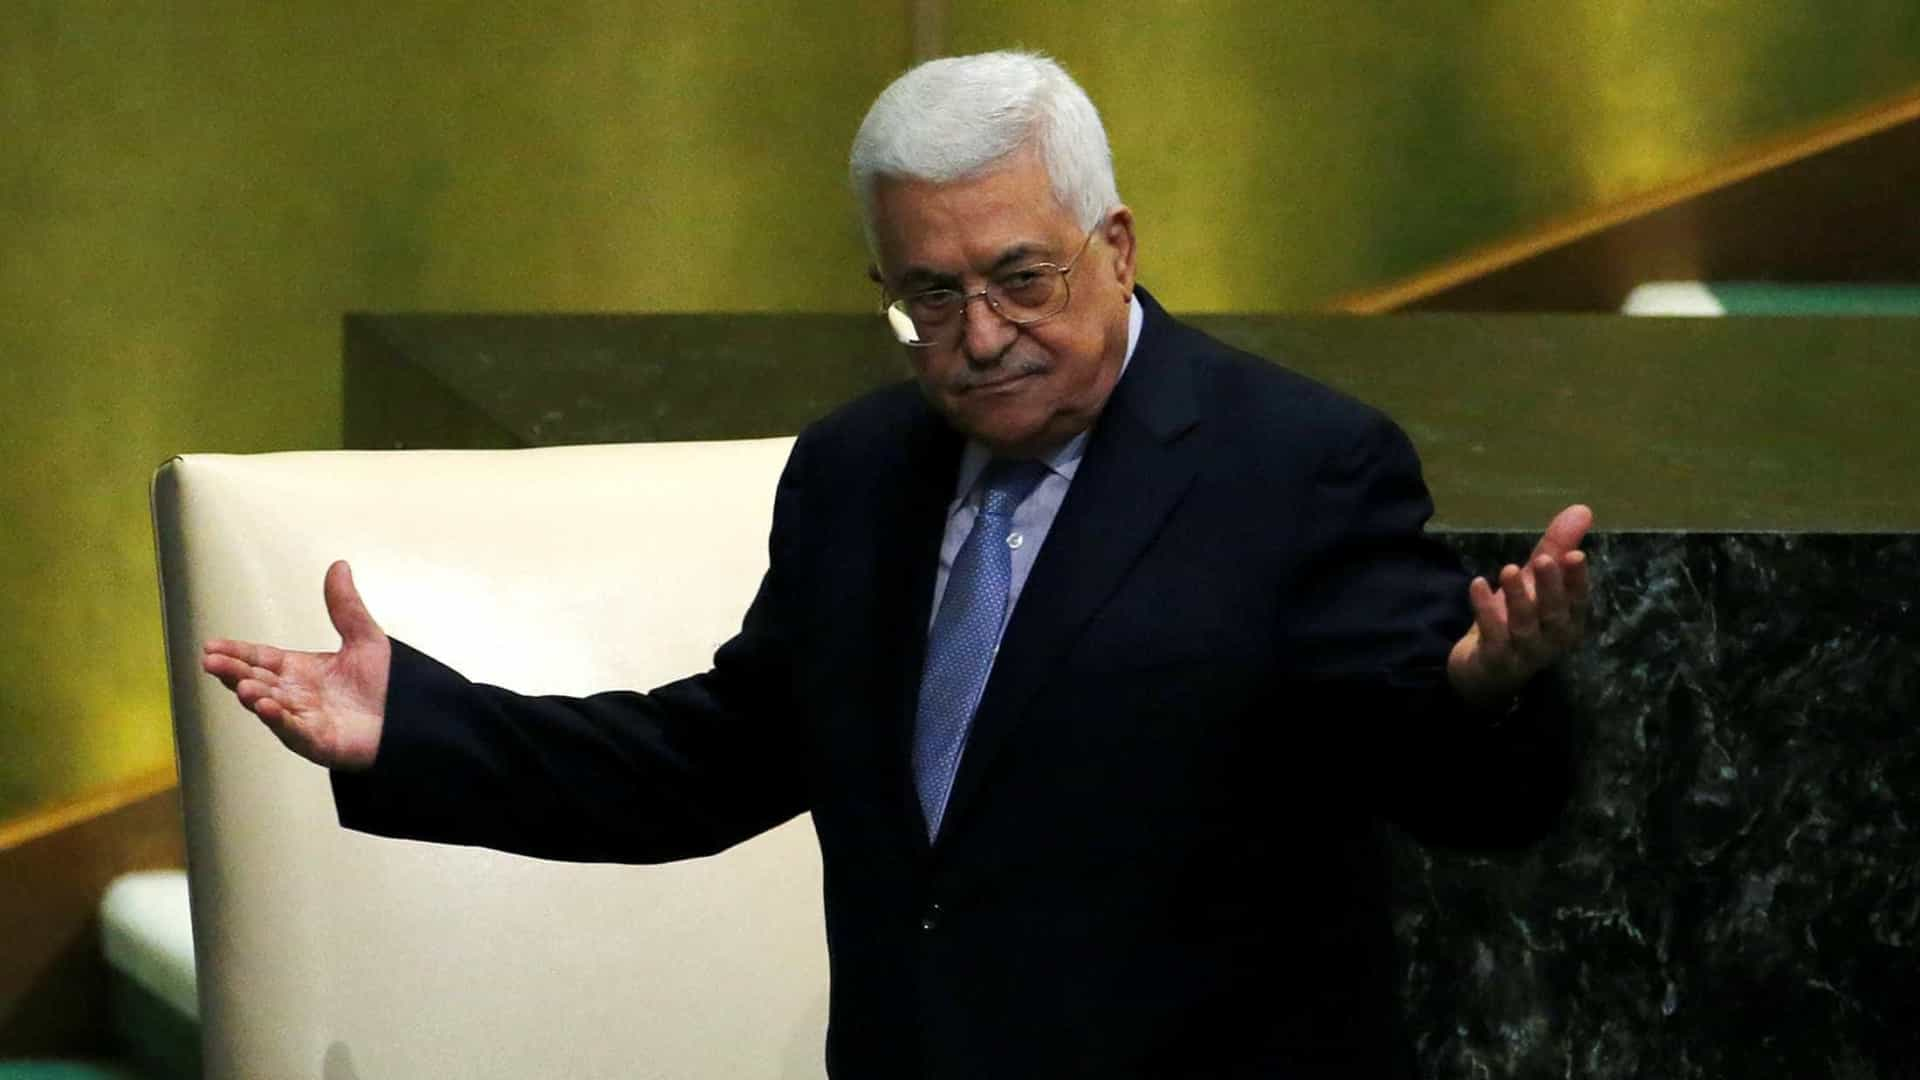 Jerusalém é 'eterna capital da Palestina', diz Abbas